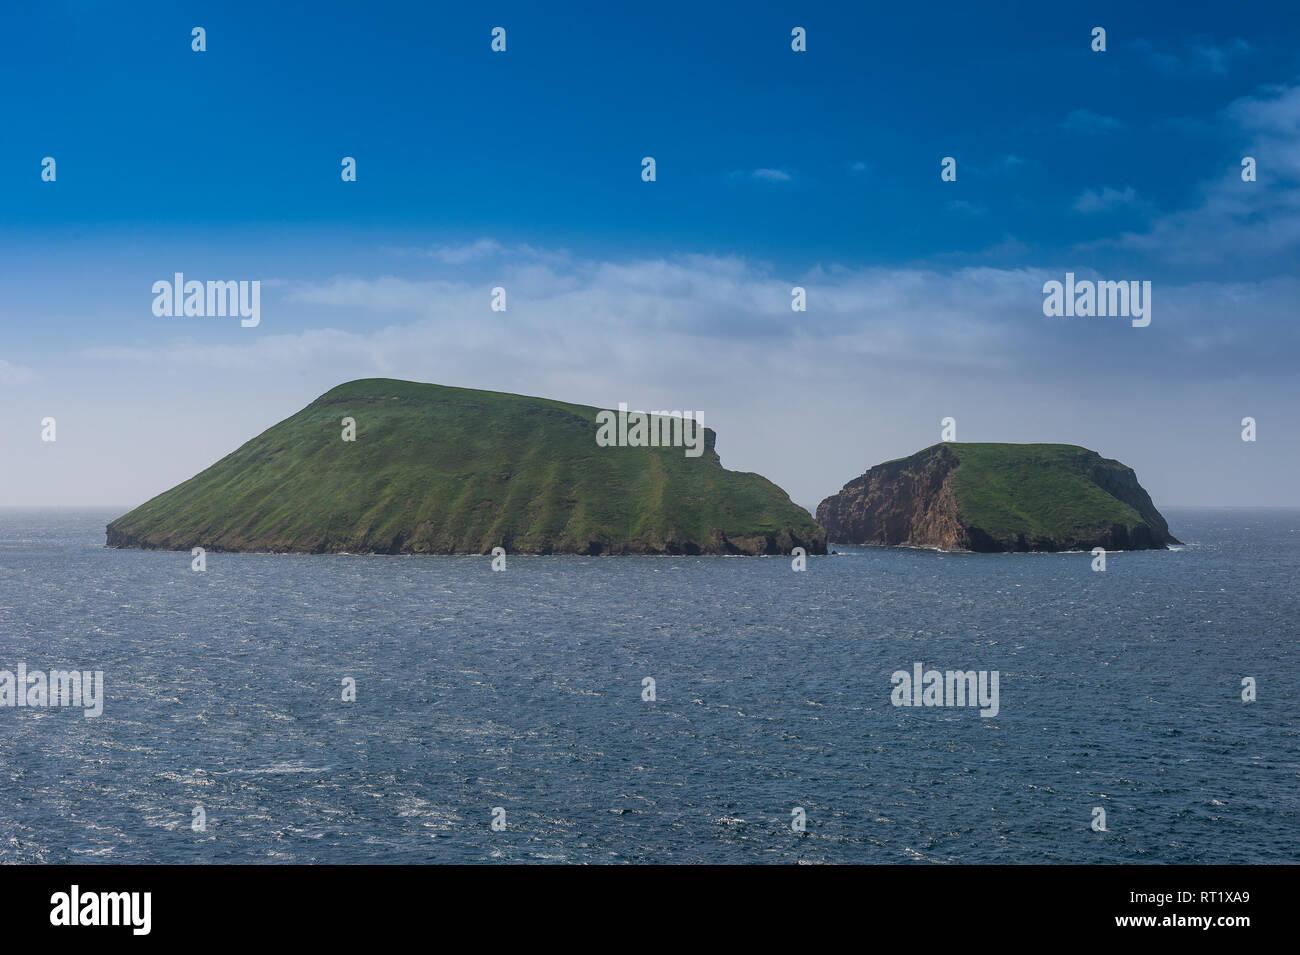 Portugal, Azores, Island of Terceira, Ilheus das Cabras, island broken in two parts - Stock Image